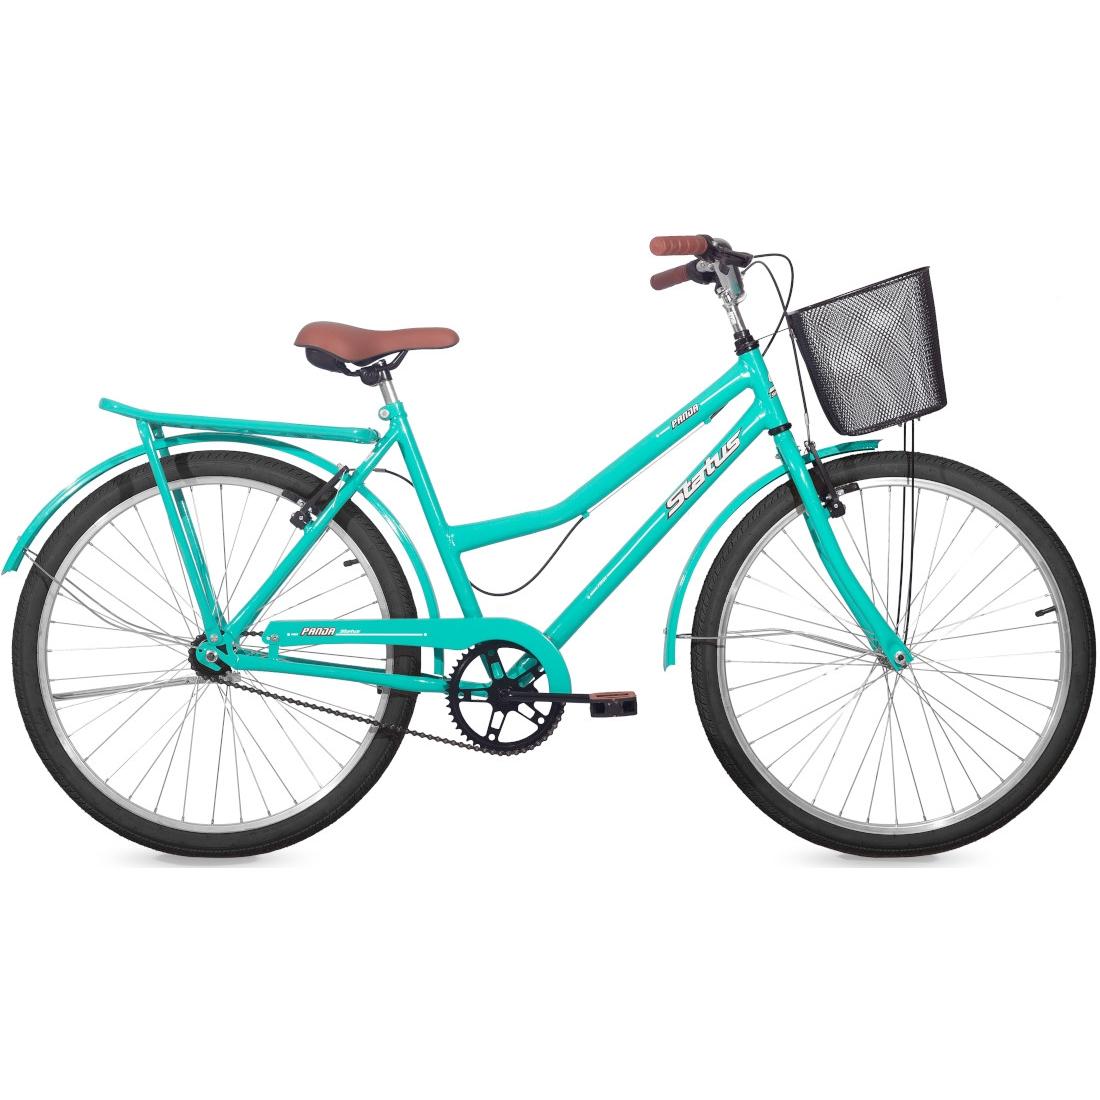 Bicicleta Retrô Vintage Aro 26 V-Brake Panda Azul Tok Stok